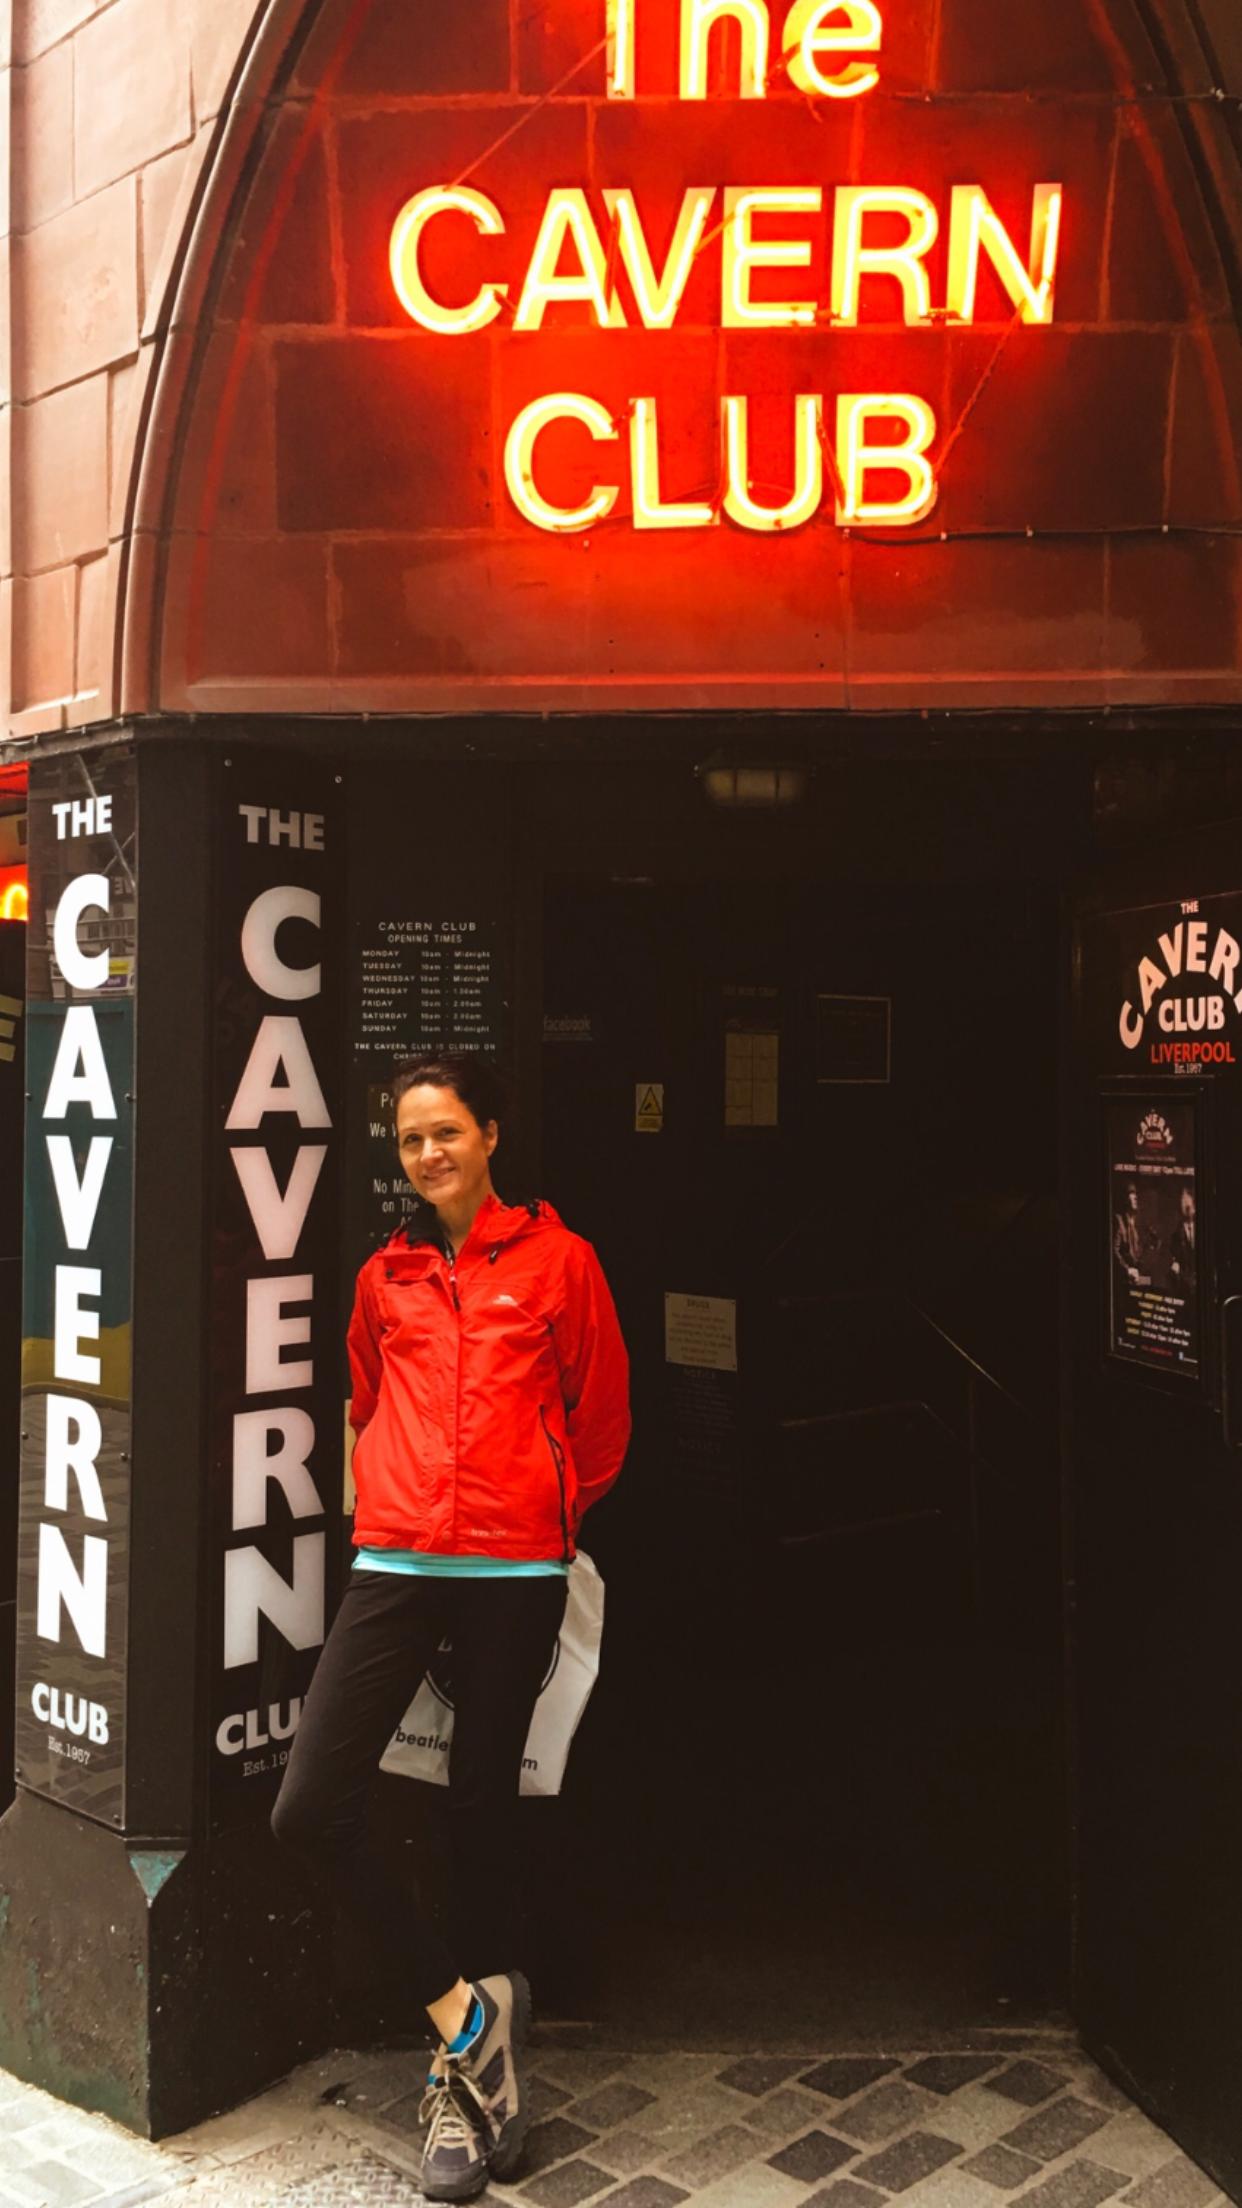 Me outside the Cavern Club.